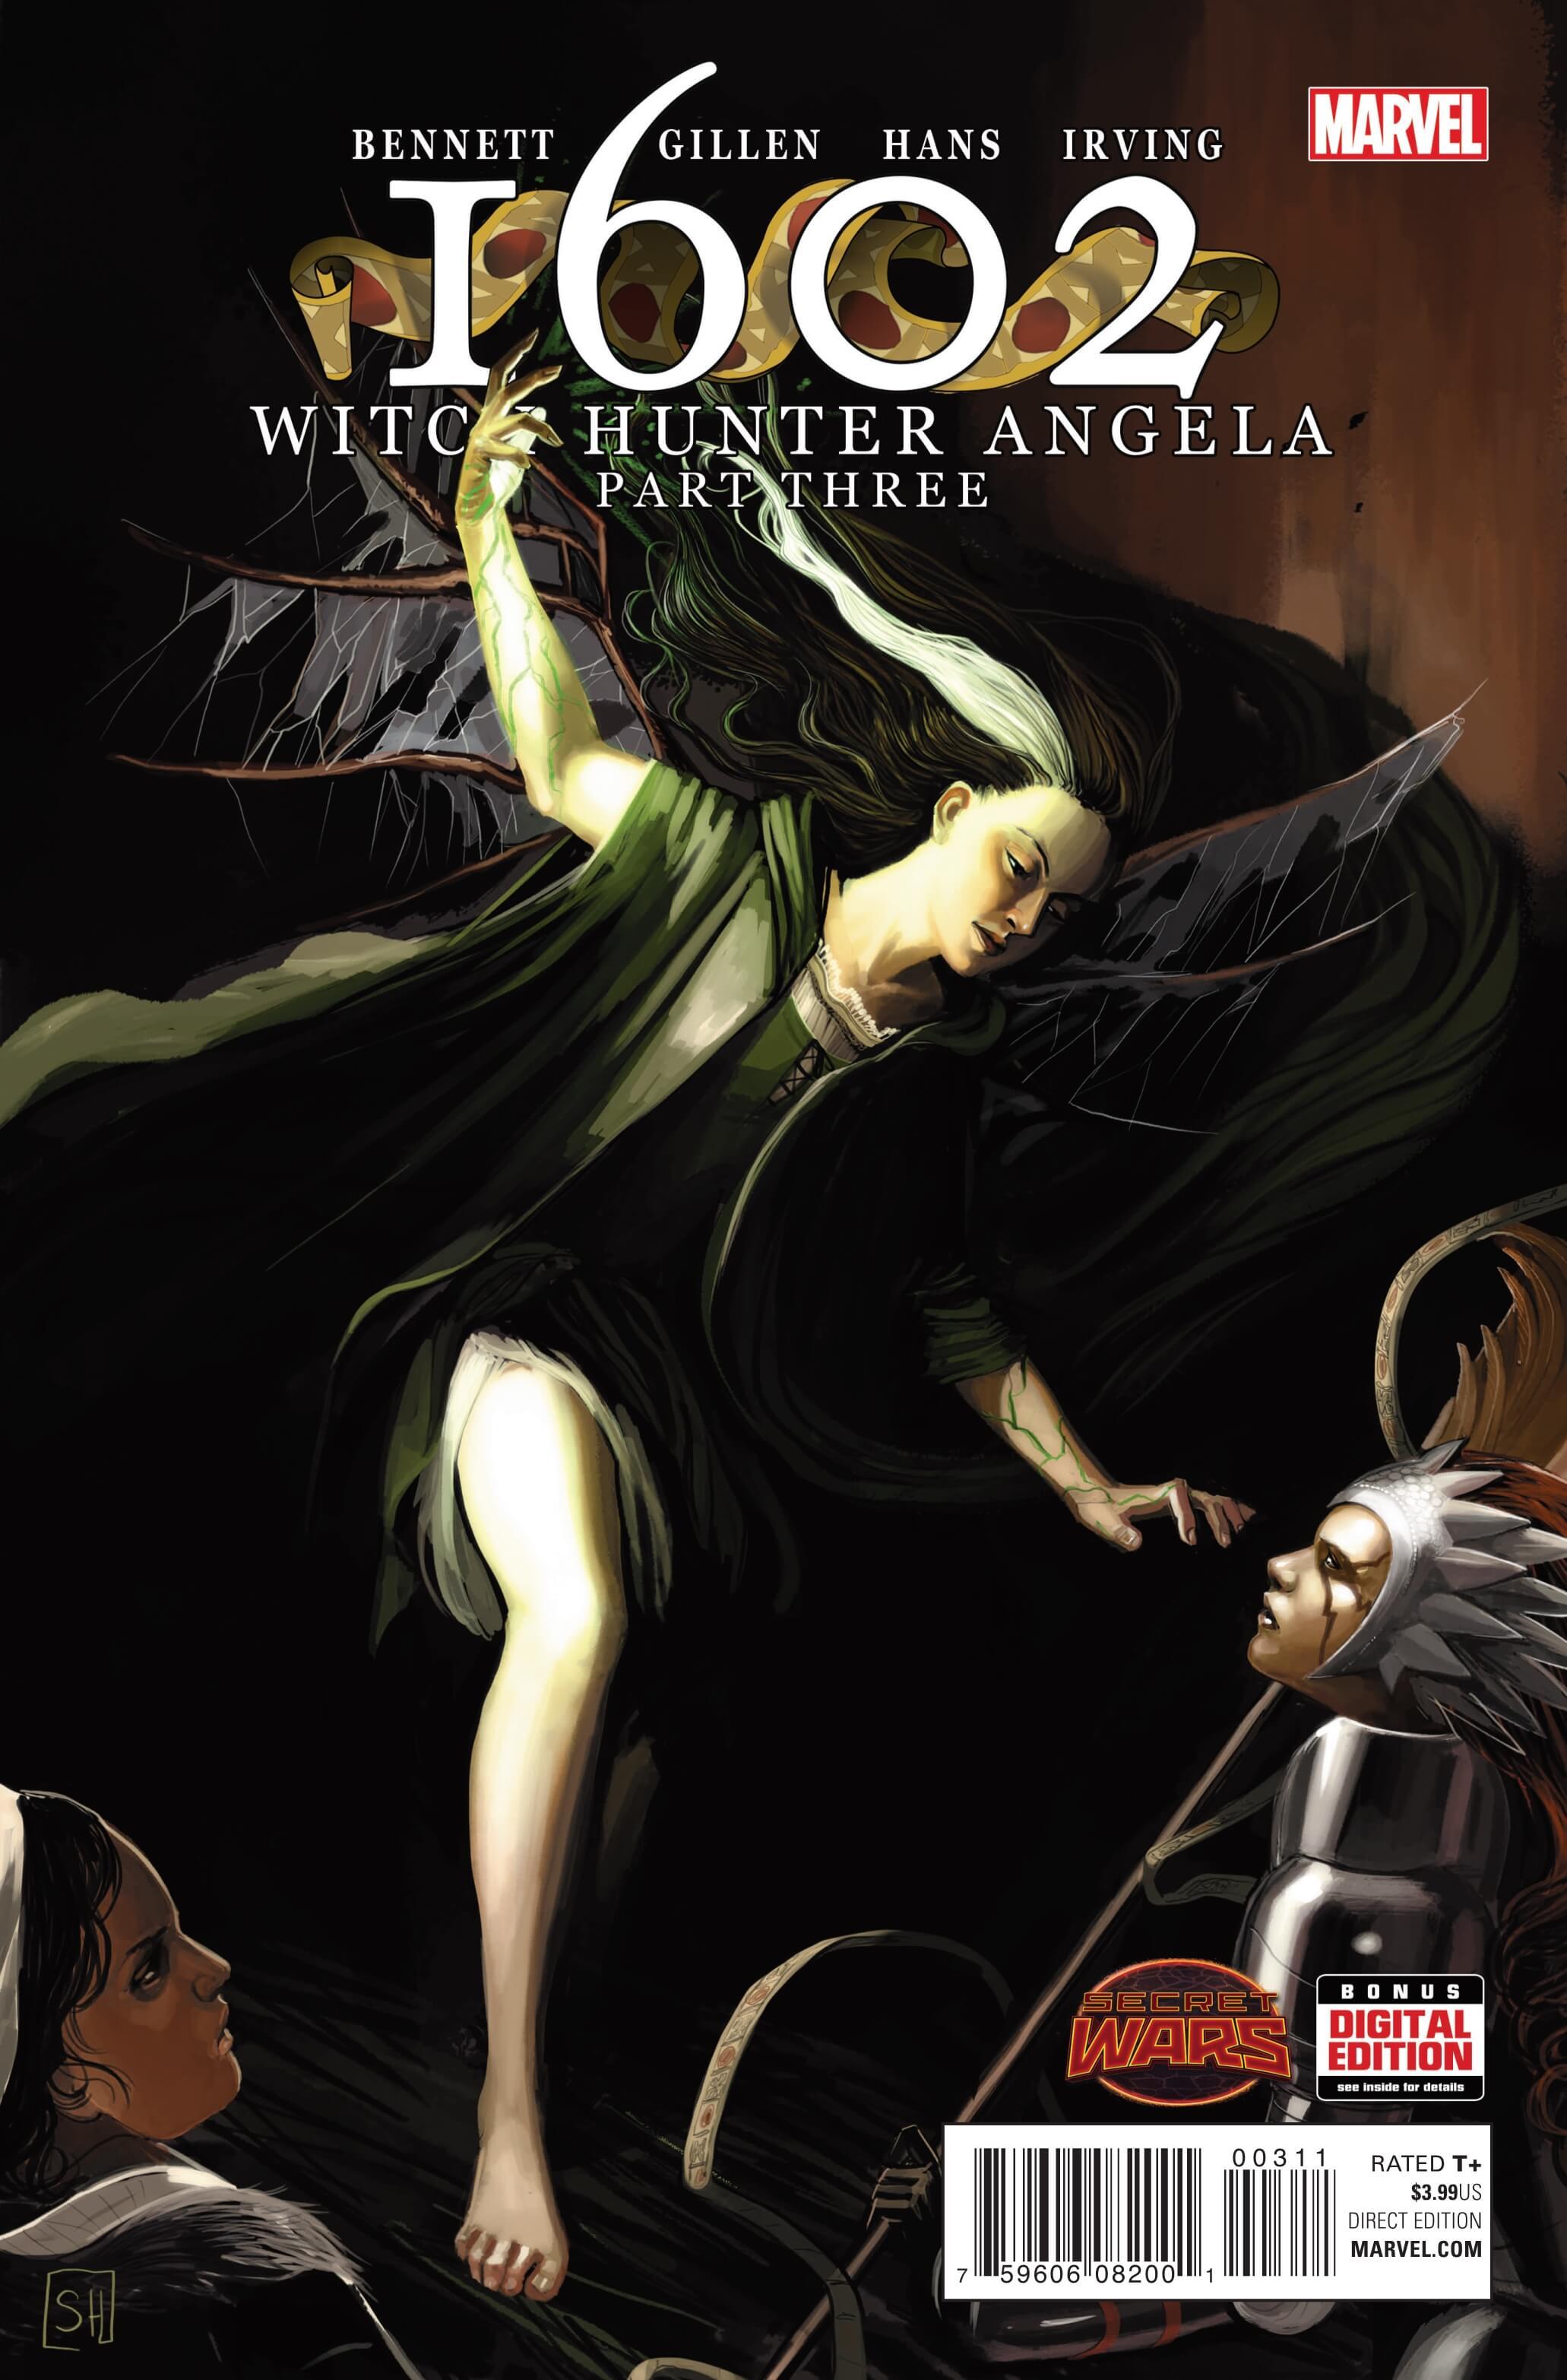 1602 Witch Hunter Angela #3cvrA